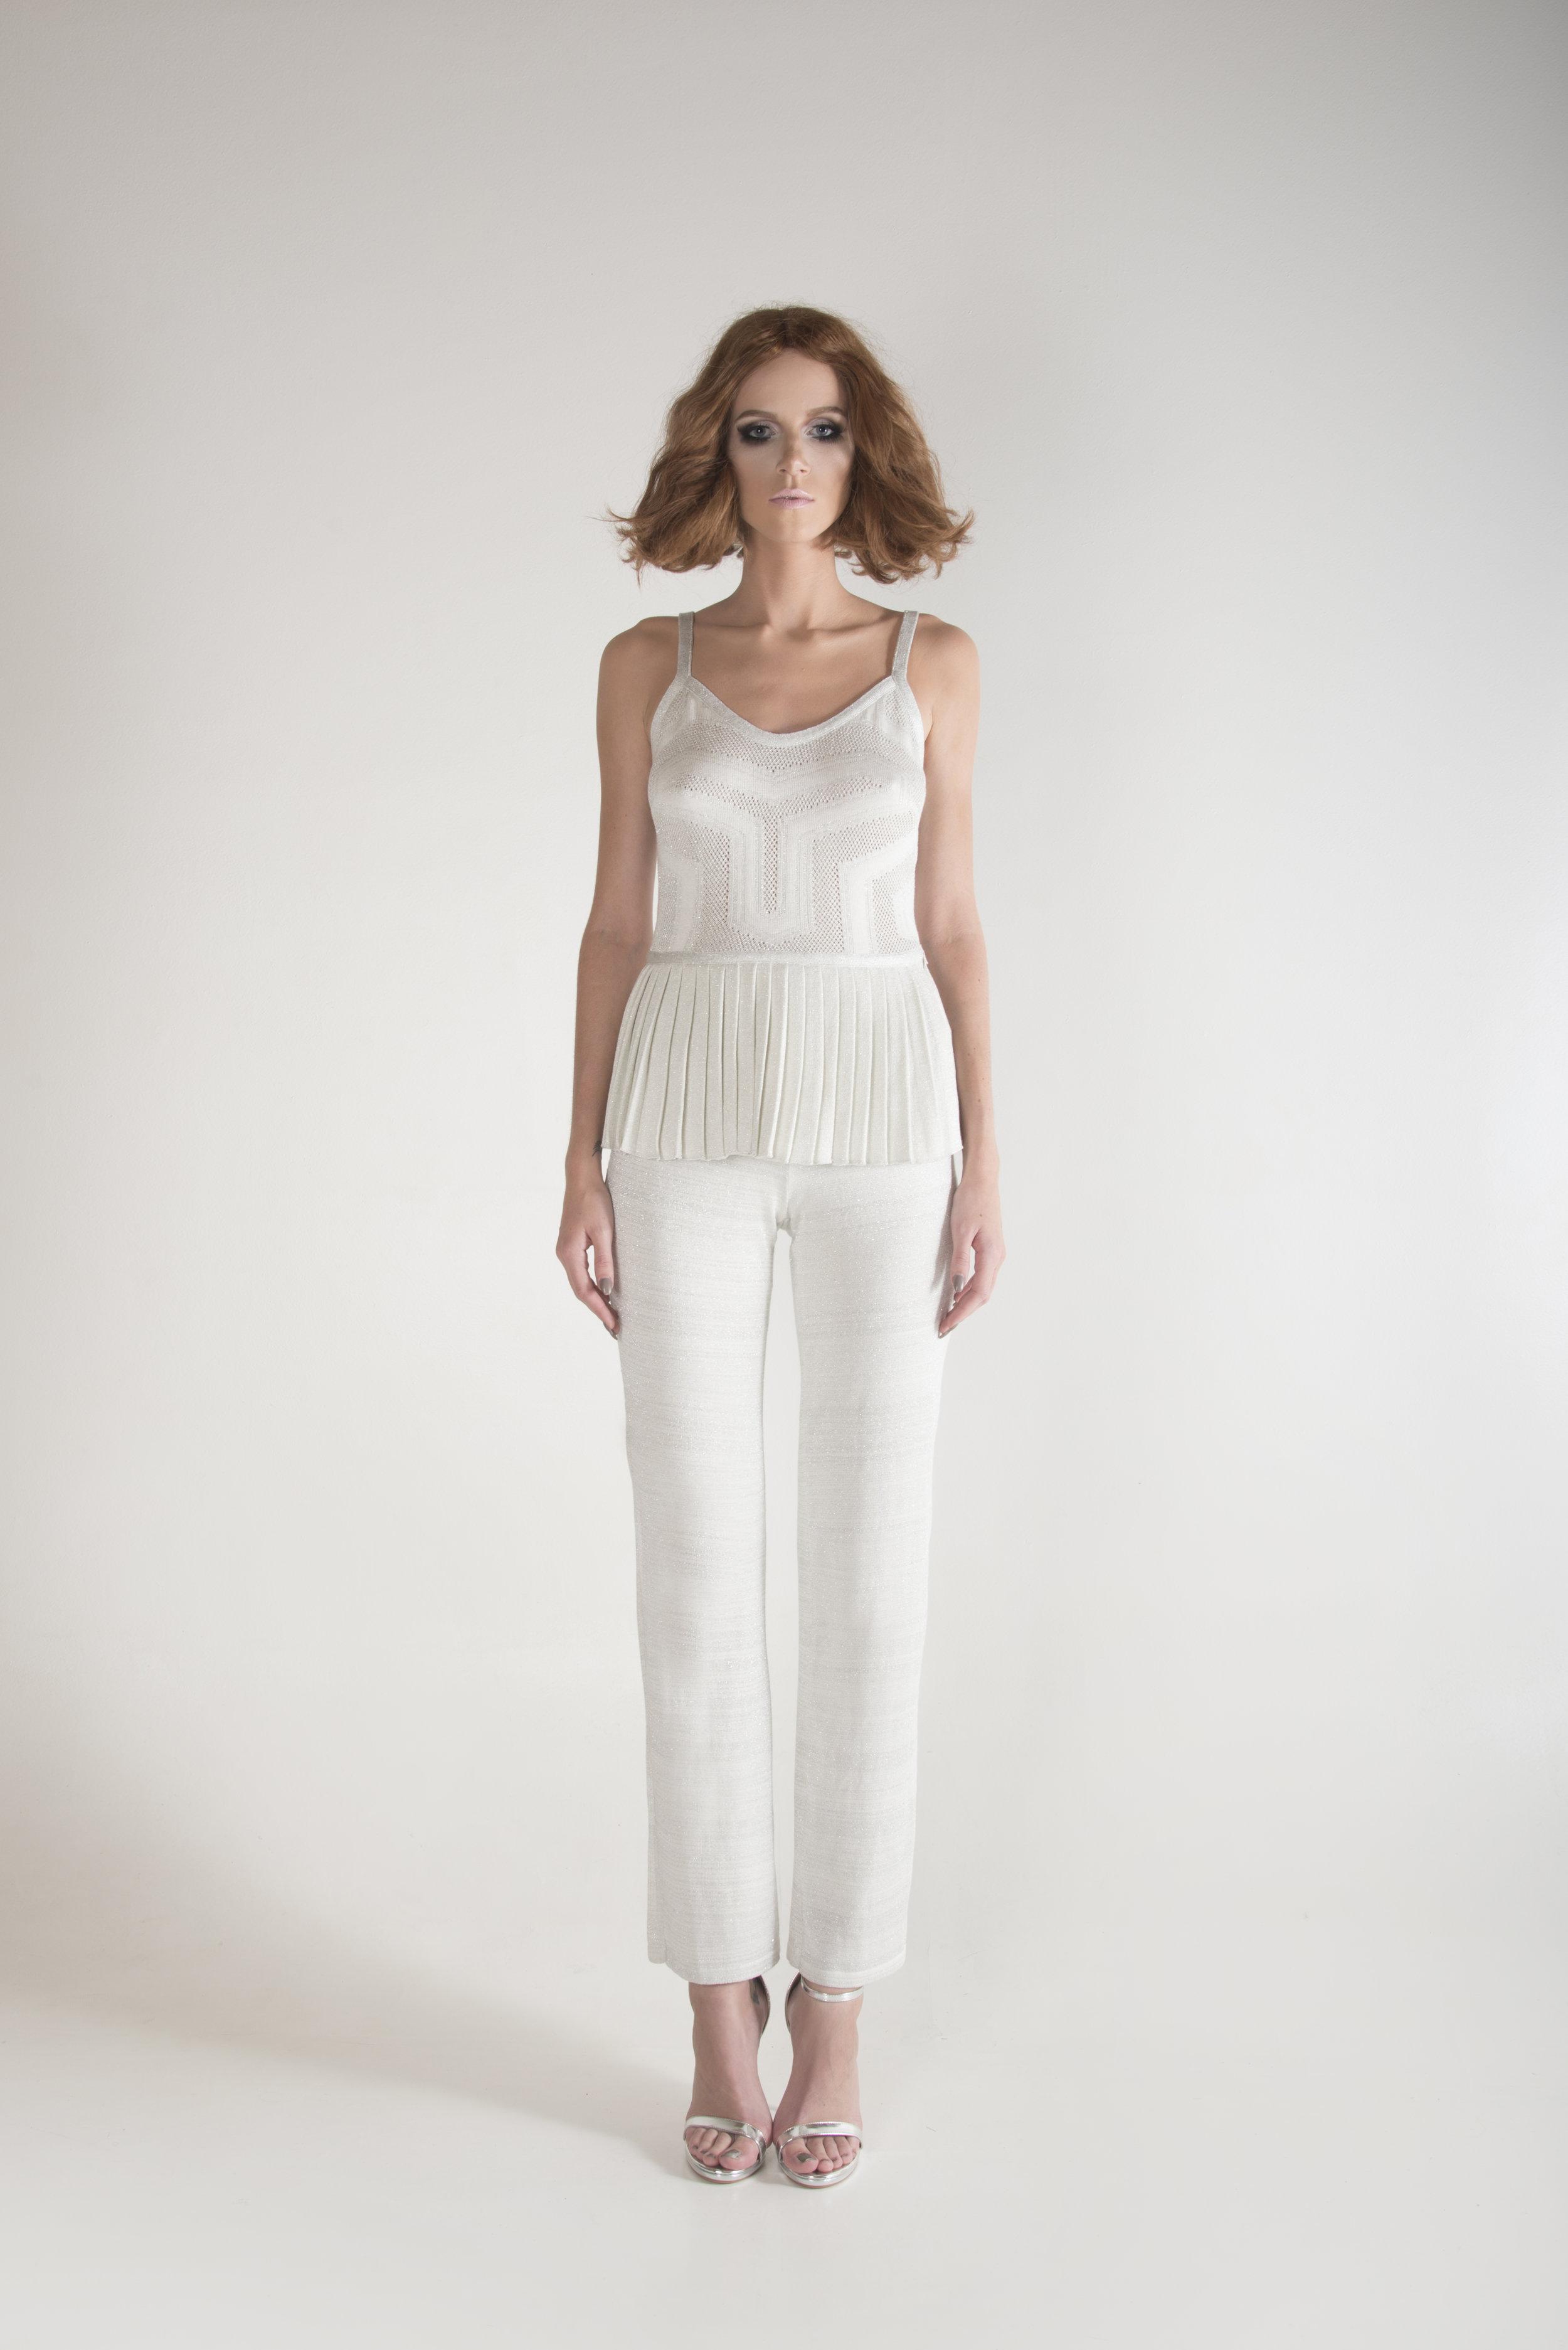 MARIA ARISTIDOU SS17 Couture